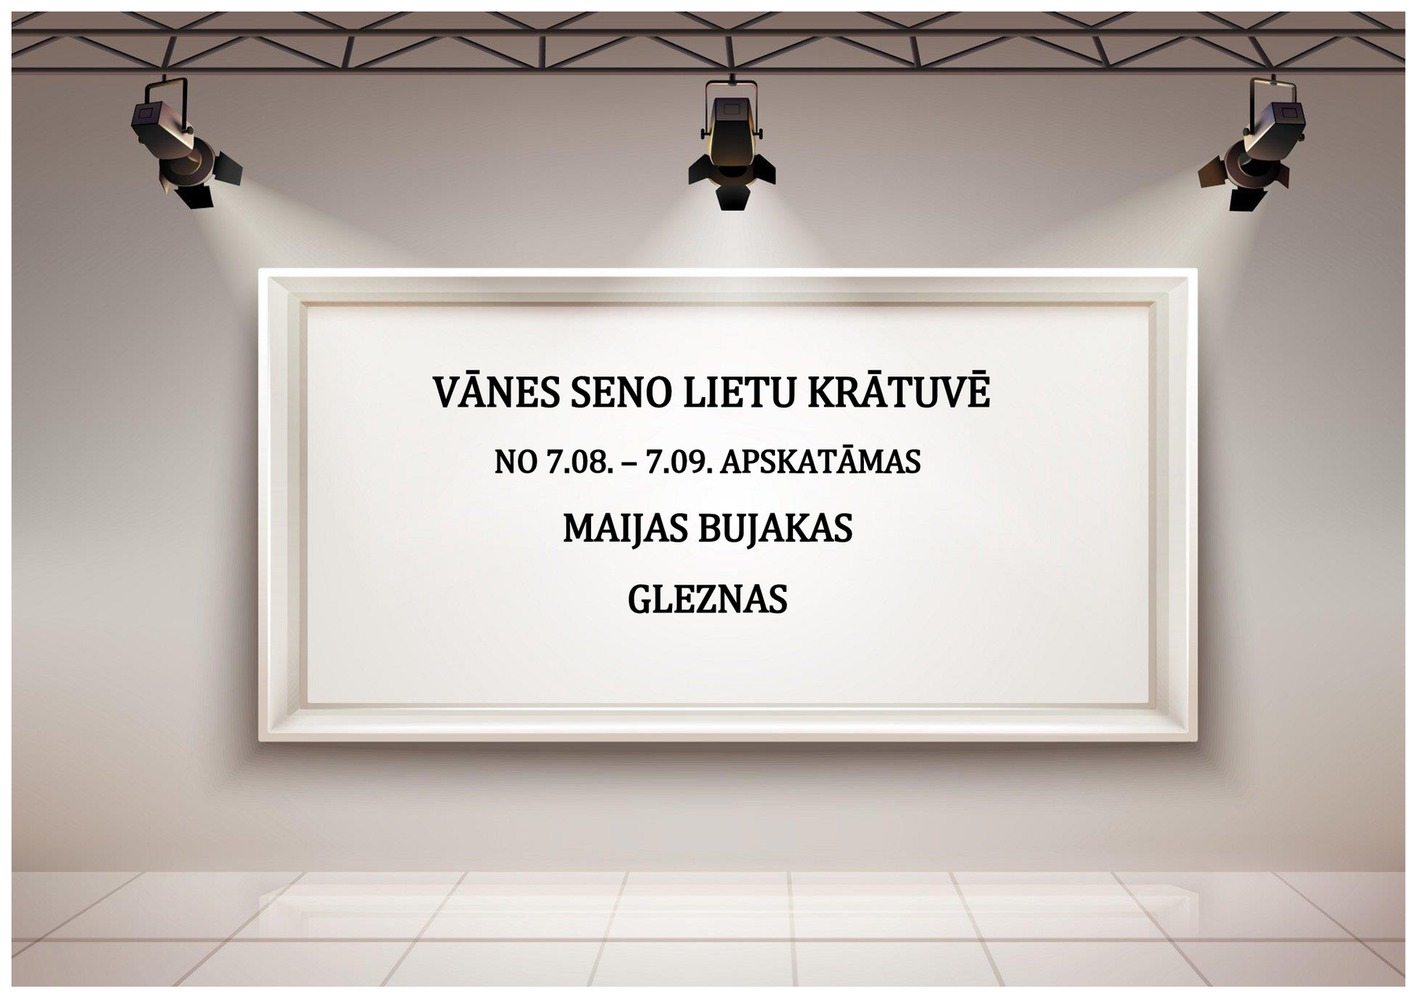 vanes_seno_lietu_kratuve.jpg